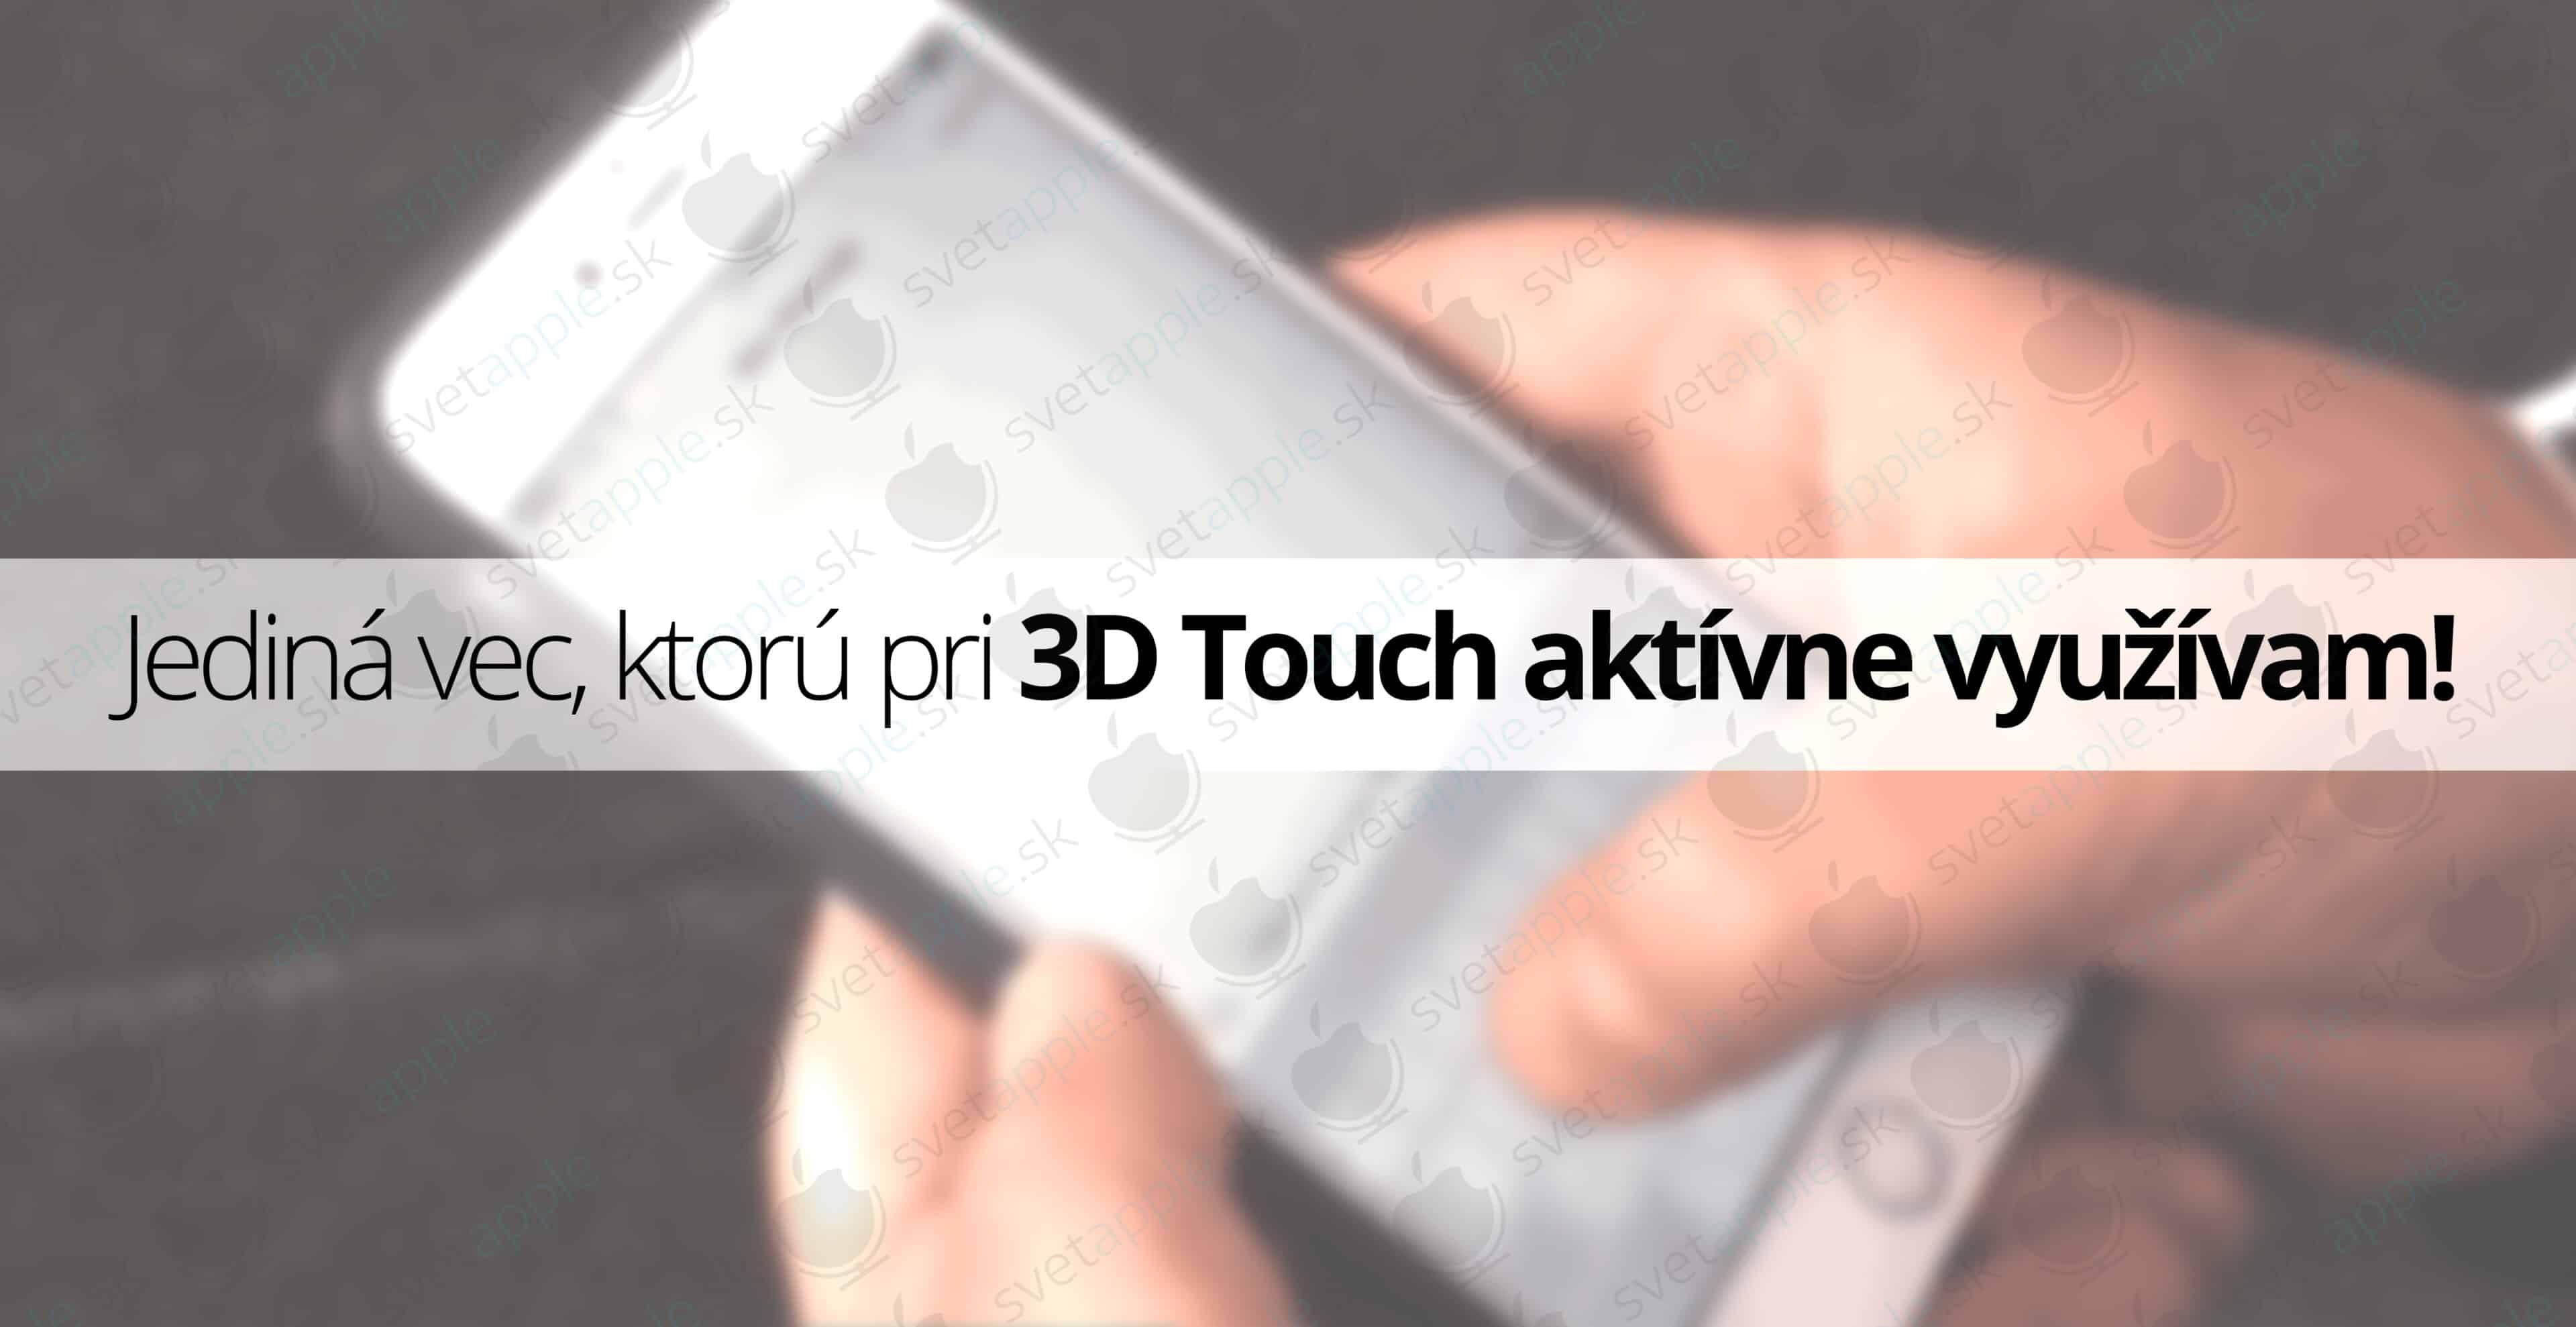 vyuzitie-3D-touch---titulná-fotografia---SvetApple